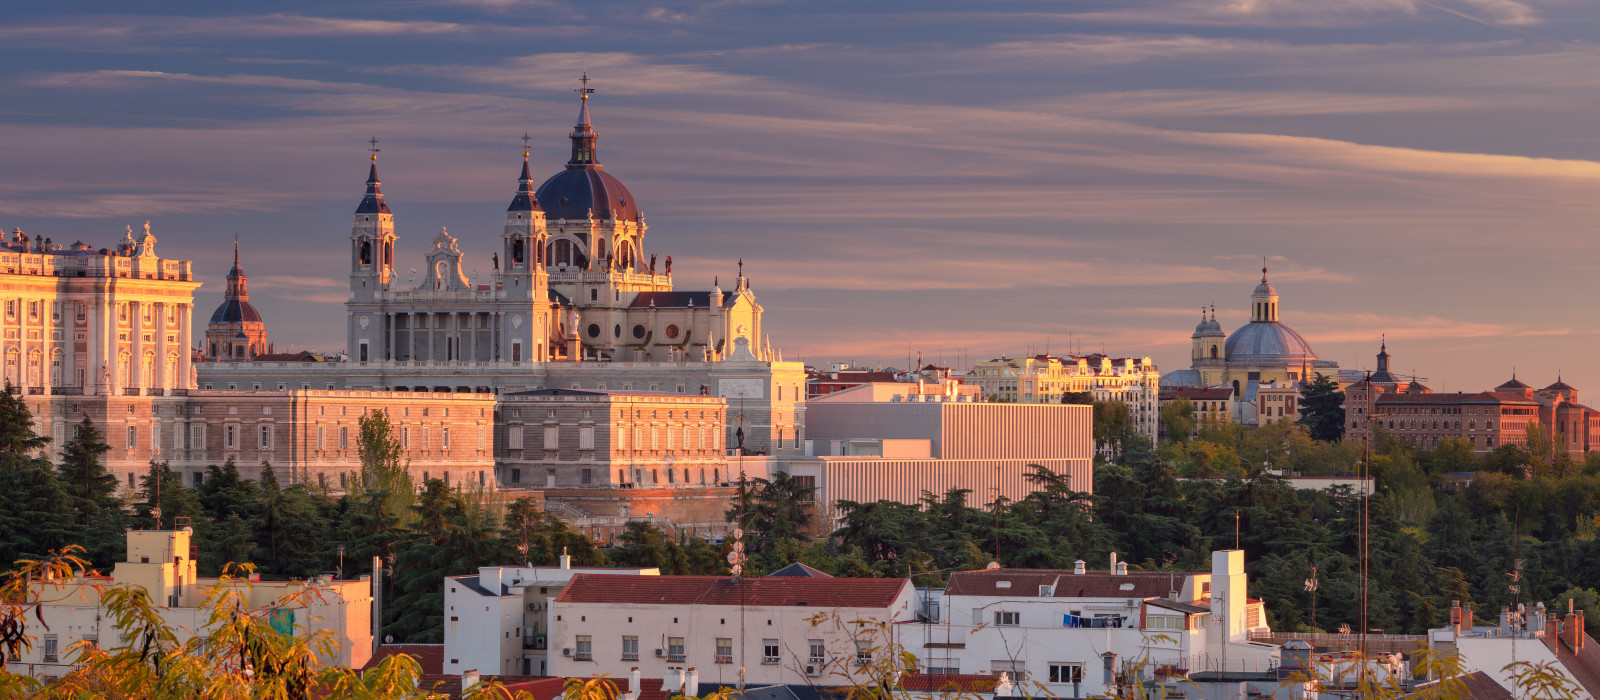 Best of Spain: Flavors, Flamenco and Fiestas Tour Trip 1